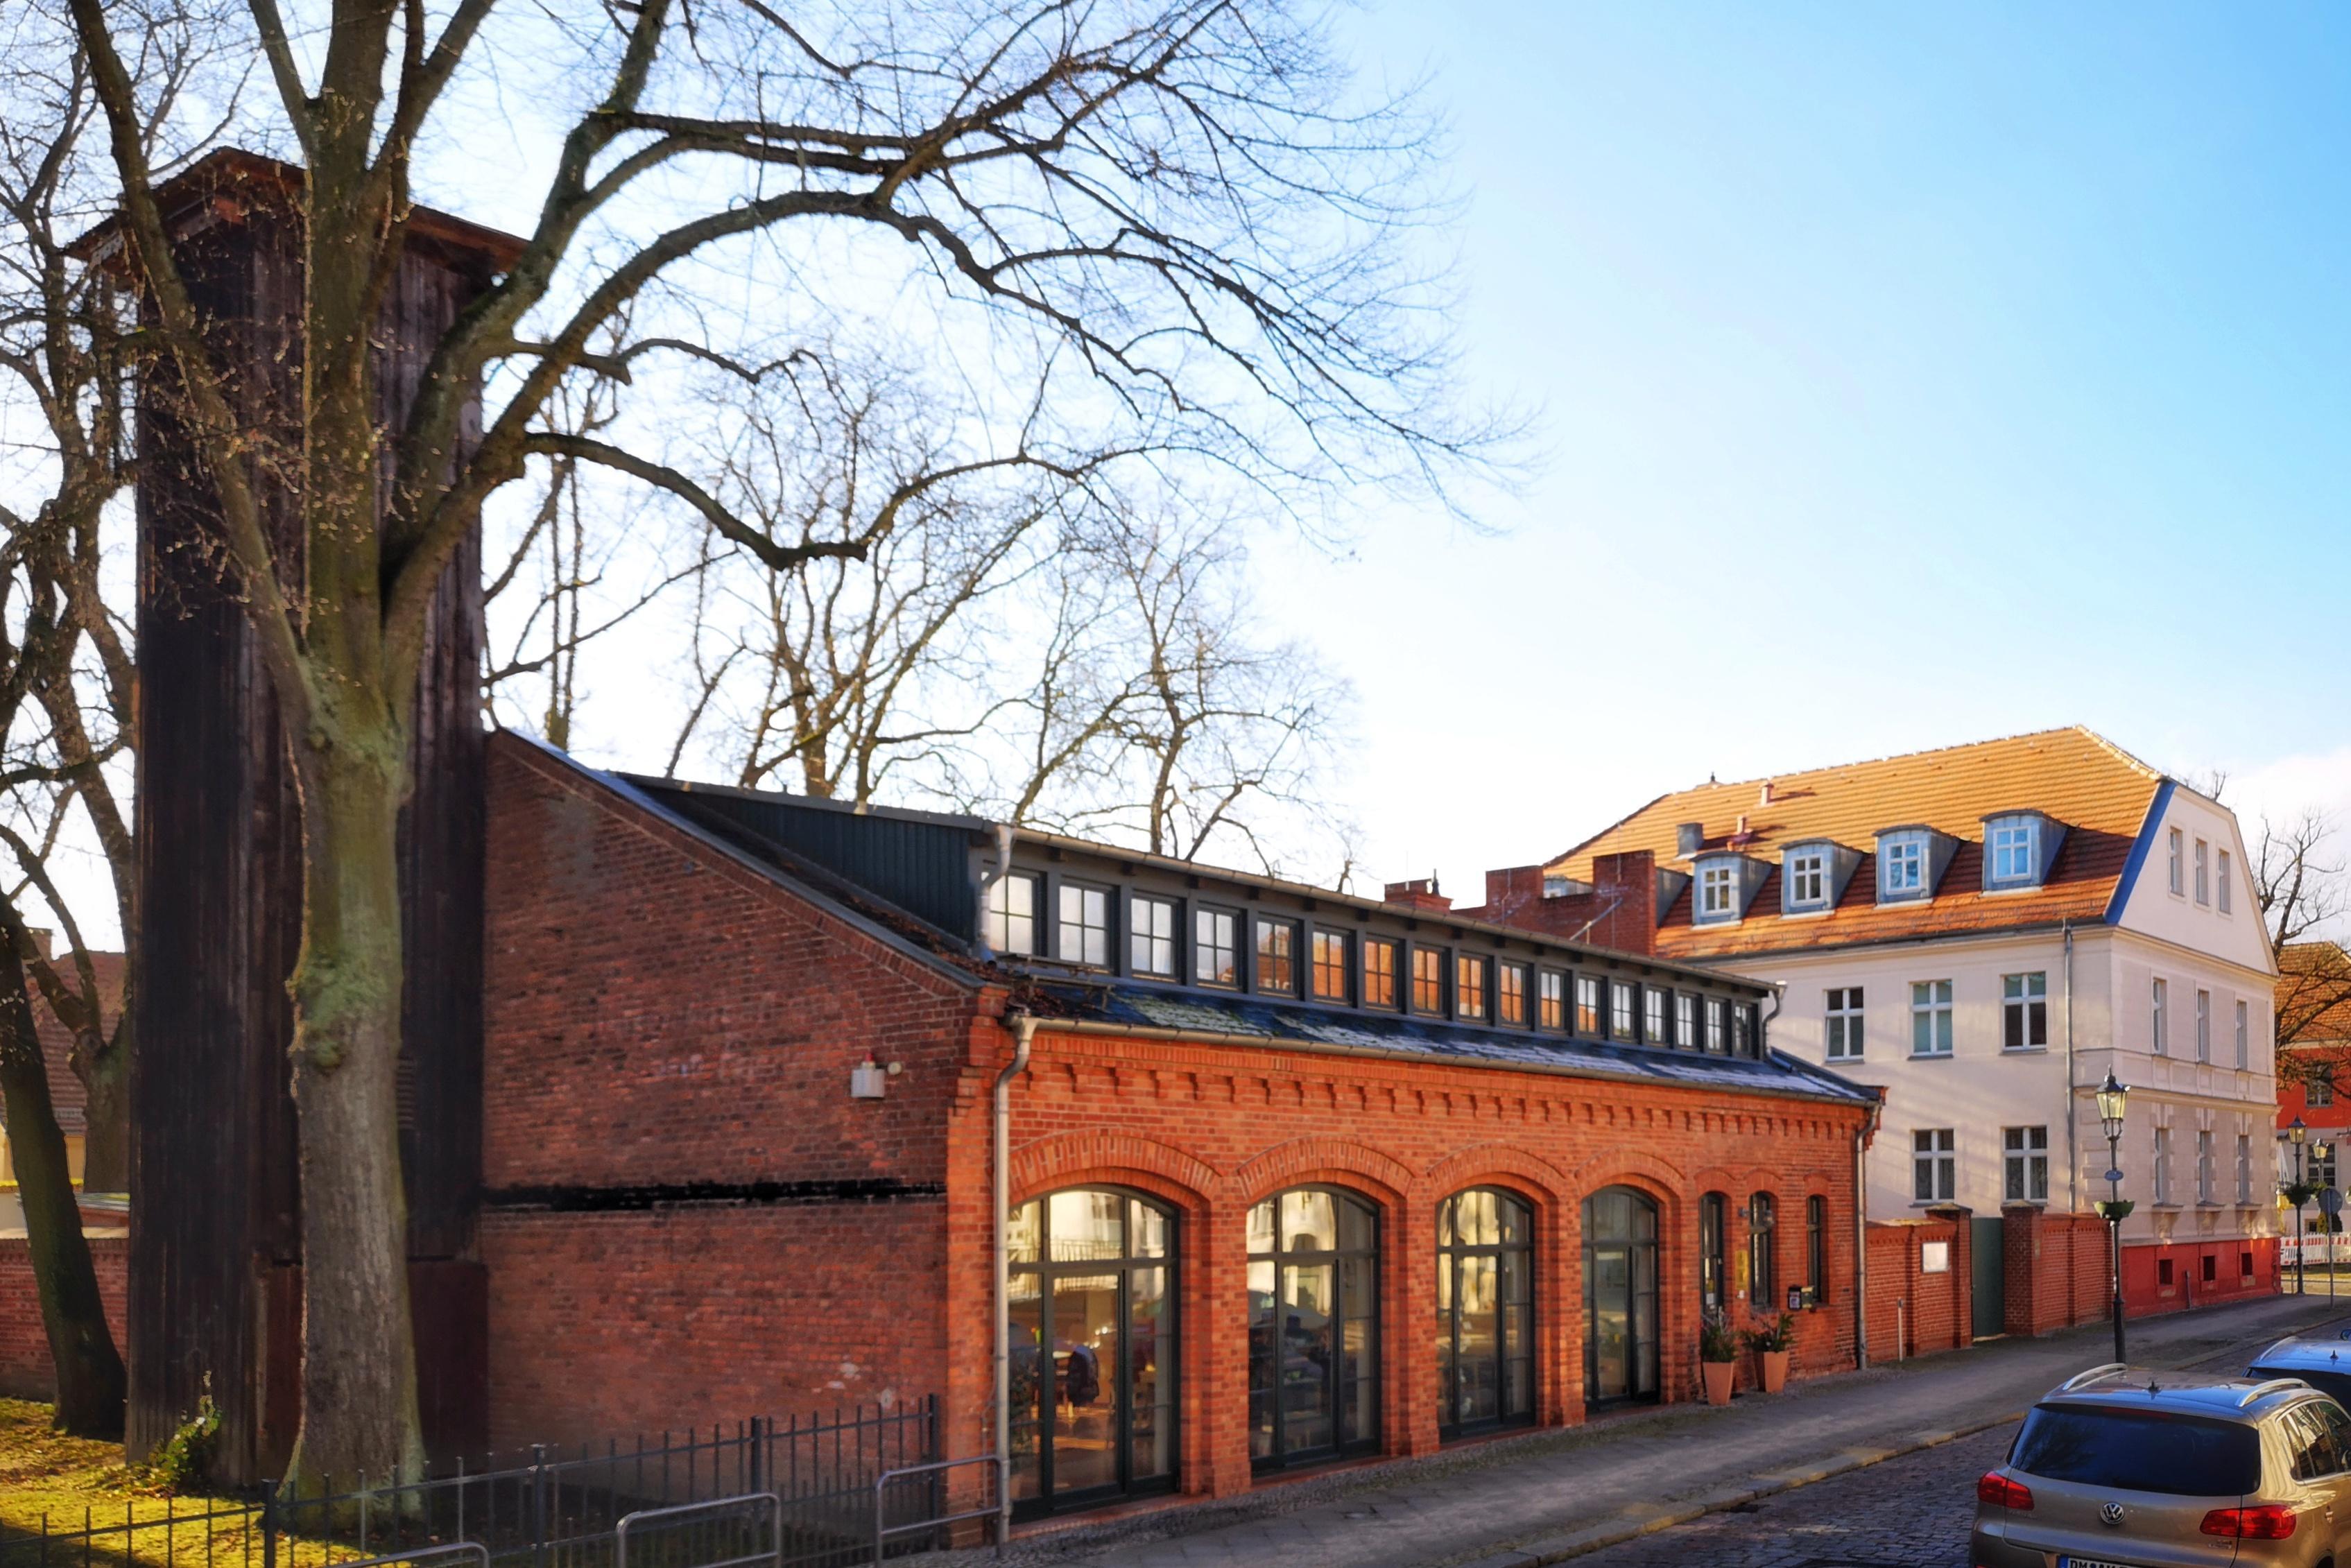 Gebäude der Jugendkunstschule Teltow